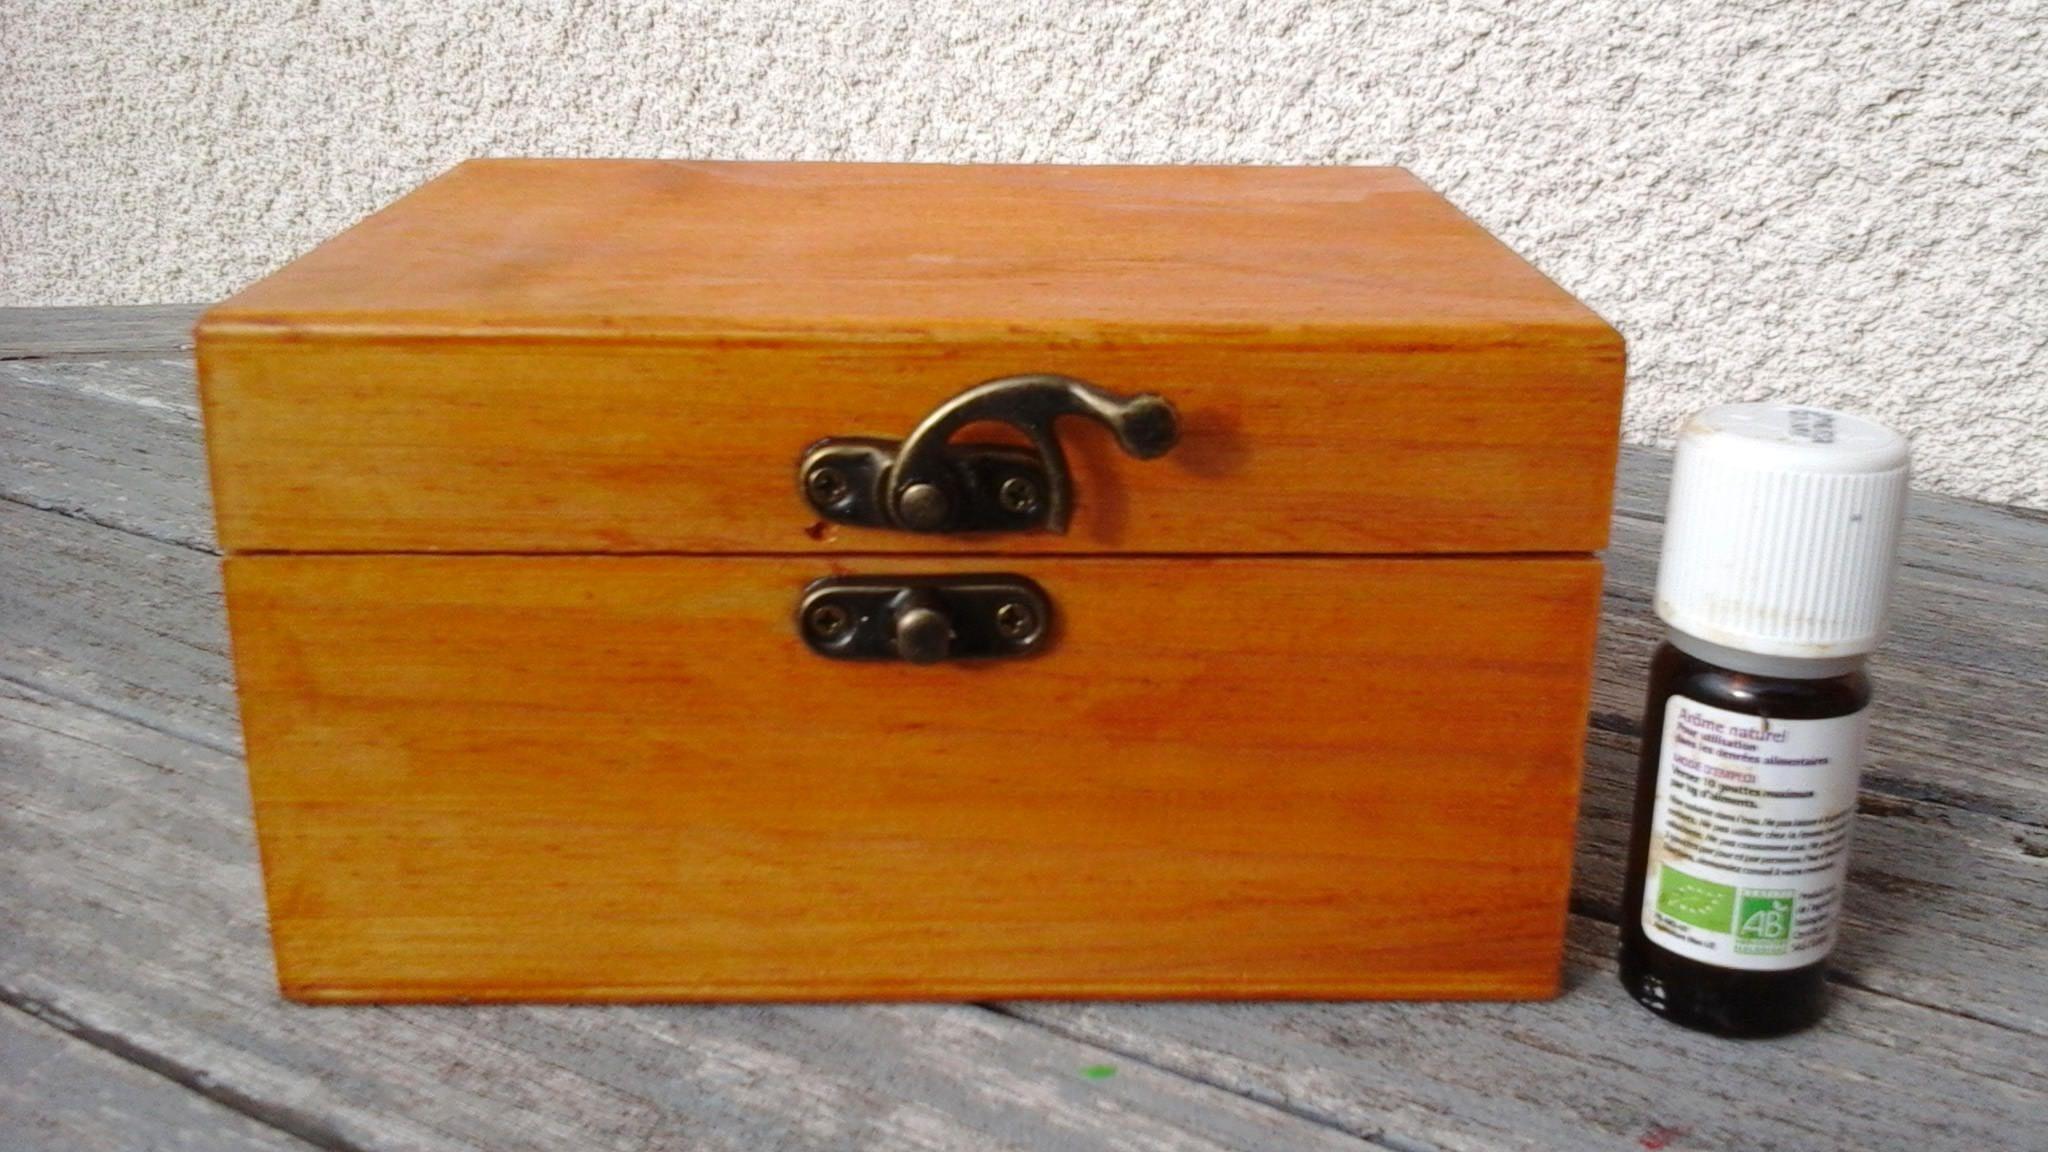 box has stone duttering wood dowsing